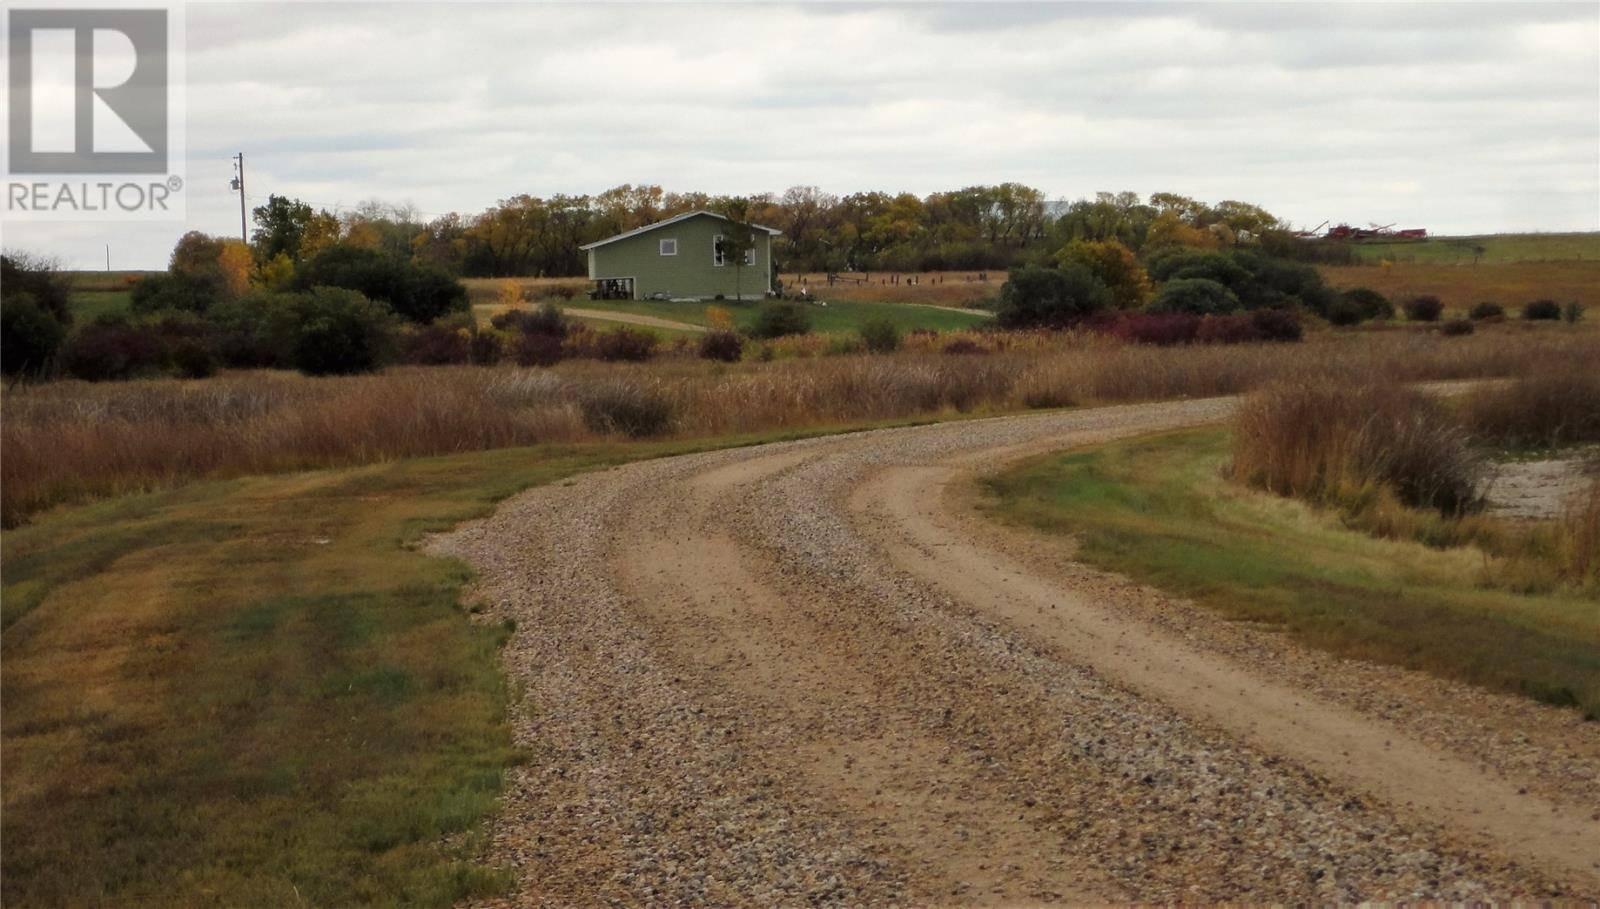 House for sale at 1 Bel Air Ln Blucher Rm No. 343 Saskatchewan - MLS: SK768849